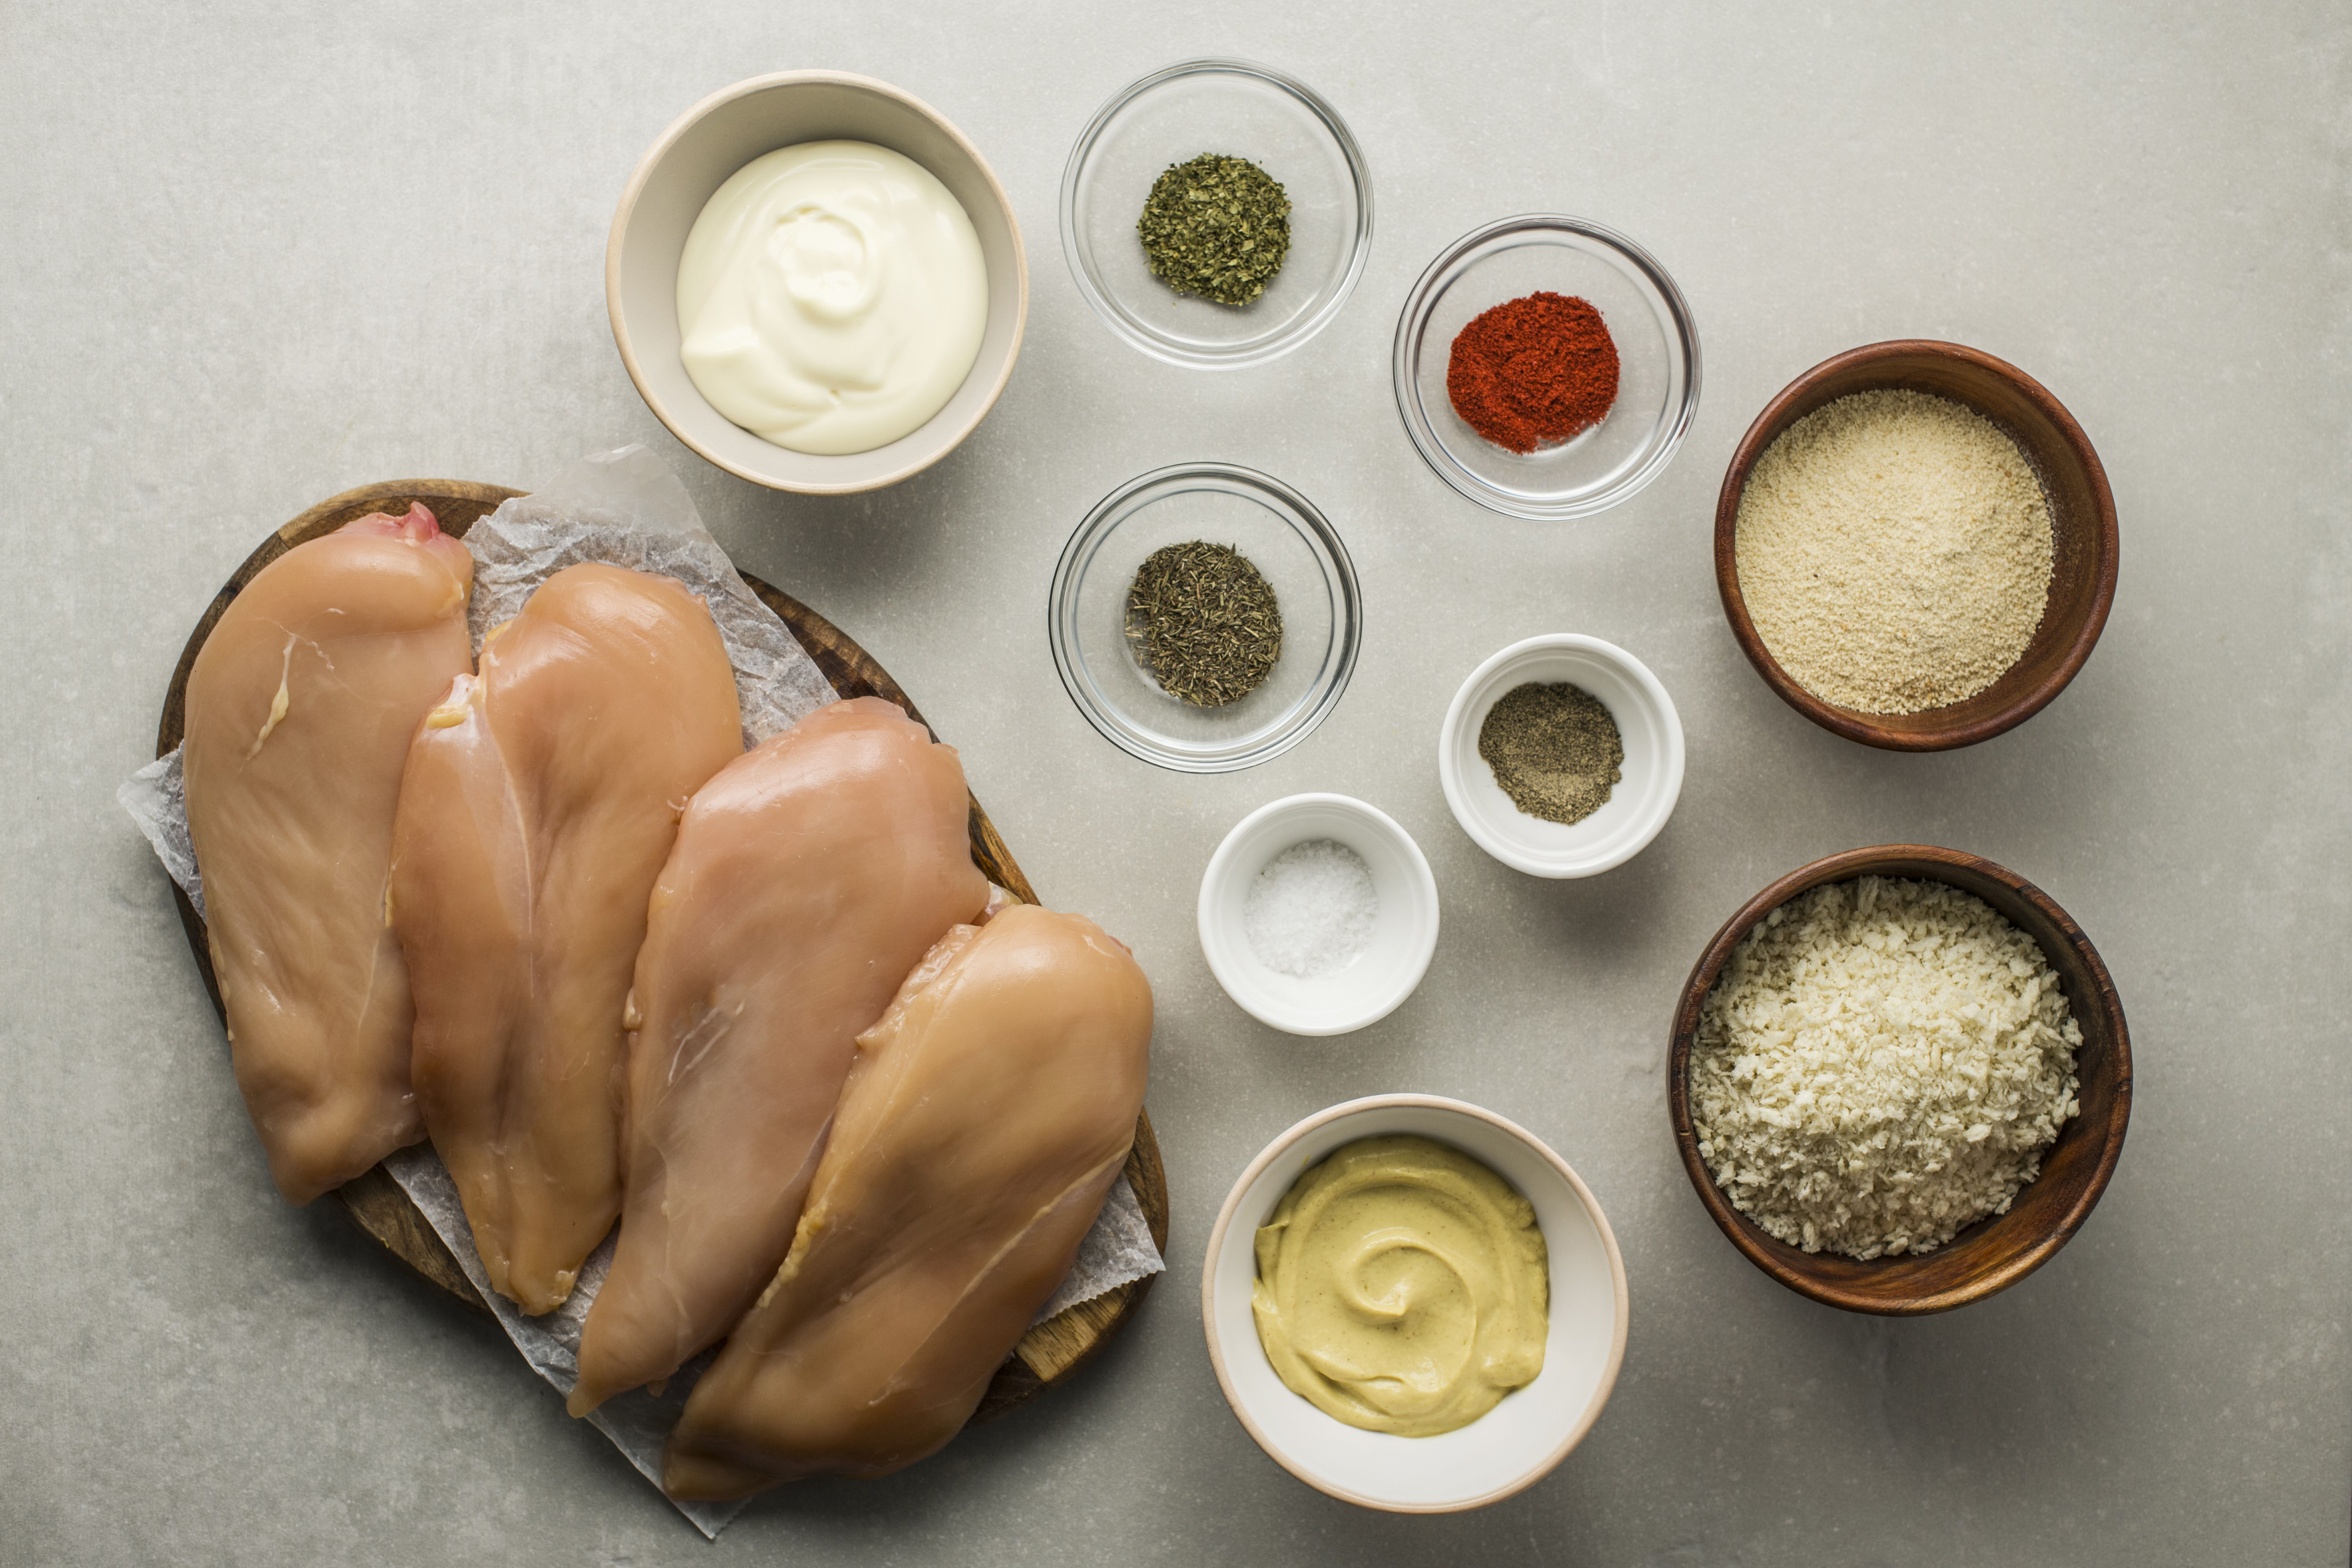 Ingredients for crispy panko coated chicken